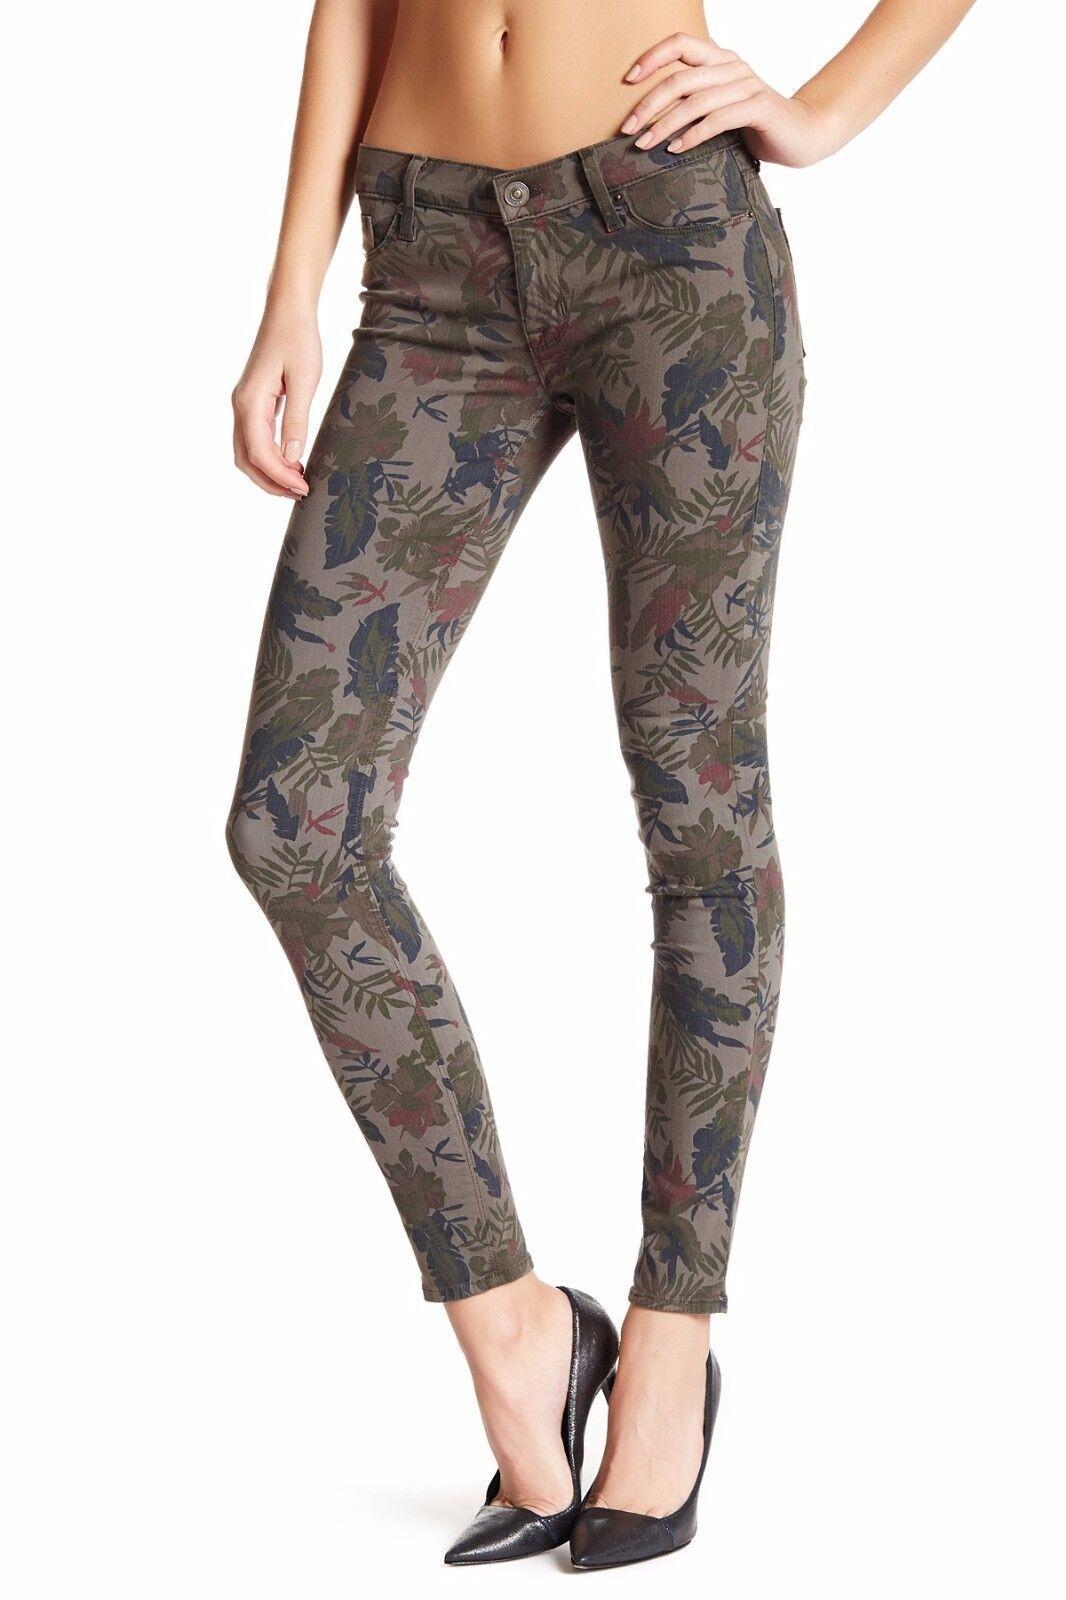 NWT HUDSON Krista Super Skinny in Bramble Leaf Floral Print Stretch Jeans 26